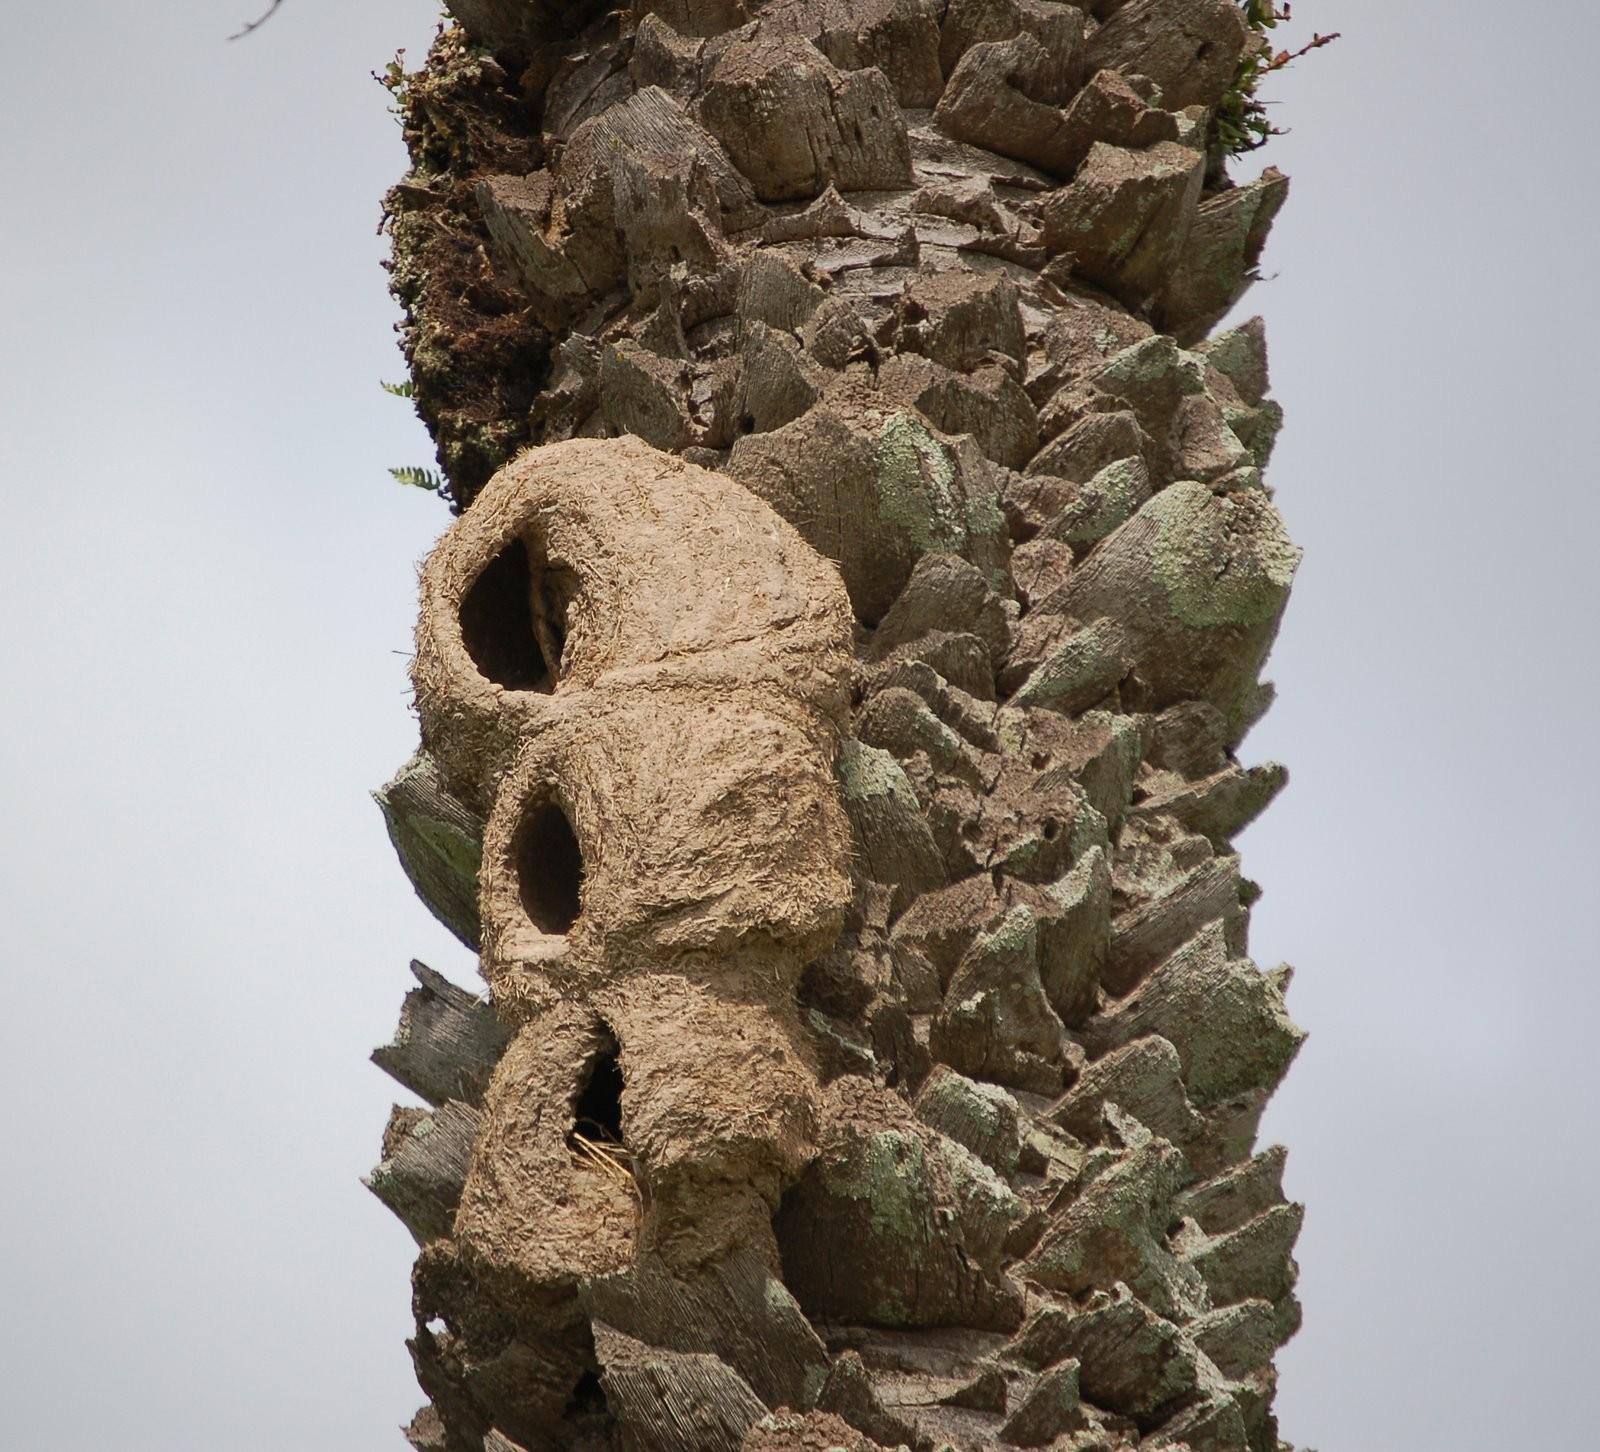 © Vía Aves de Uruguay